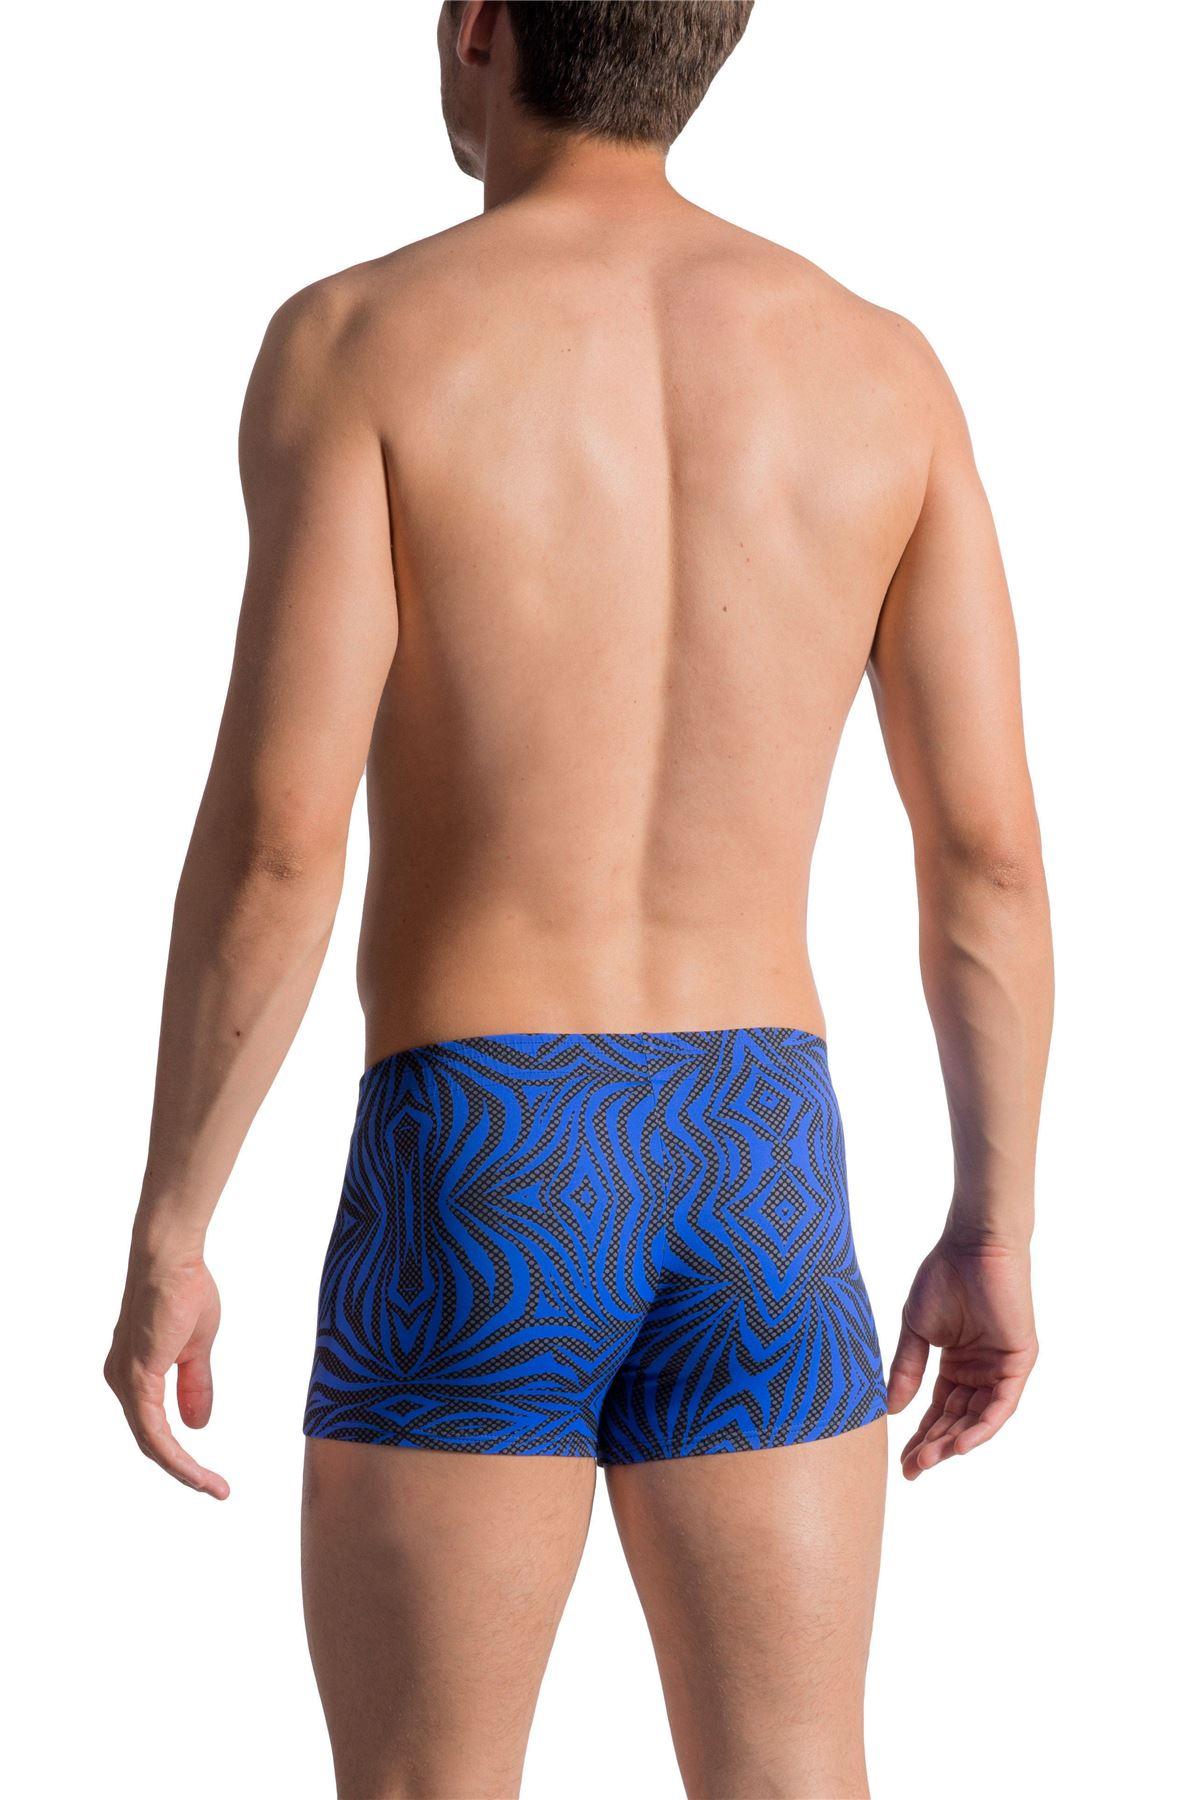 cbe1f5071b Olaf Benz Men's BLU 1750 Beach Trunks Swimming Short Bright Colours ...